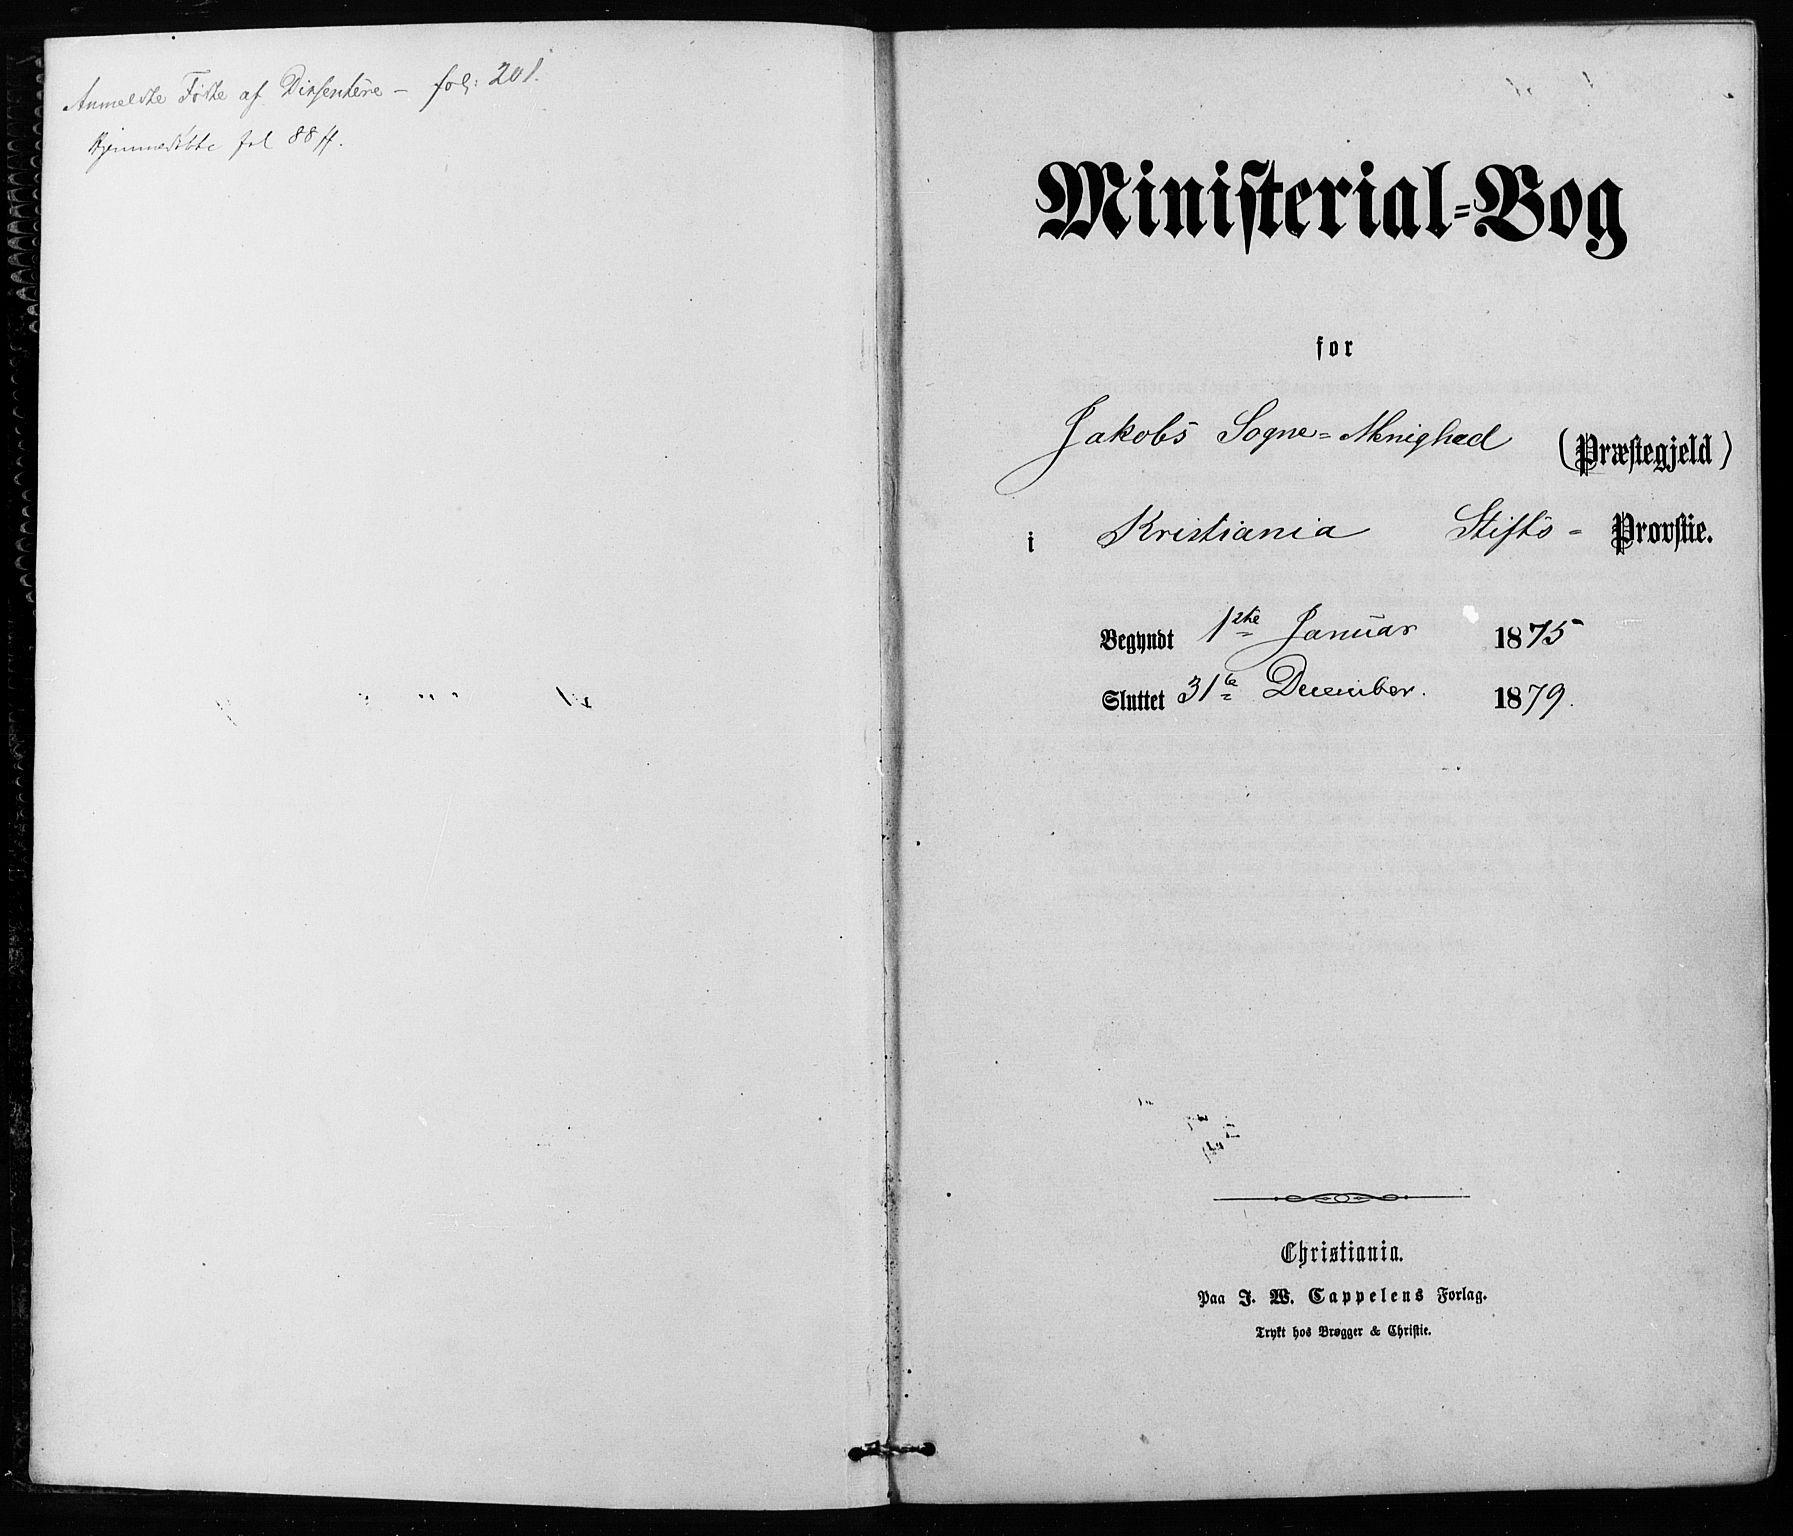 SAO, Jakob prestekontor Kirkebøker, F/Fa/L0001: Ministerialbok nr. 1, 1875-1924